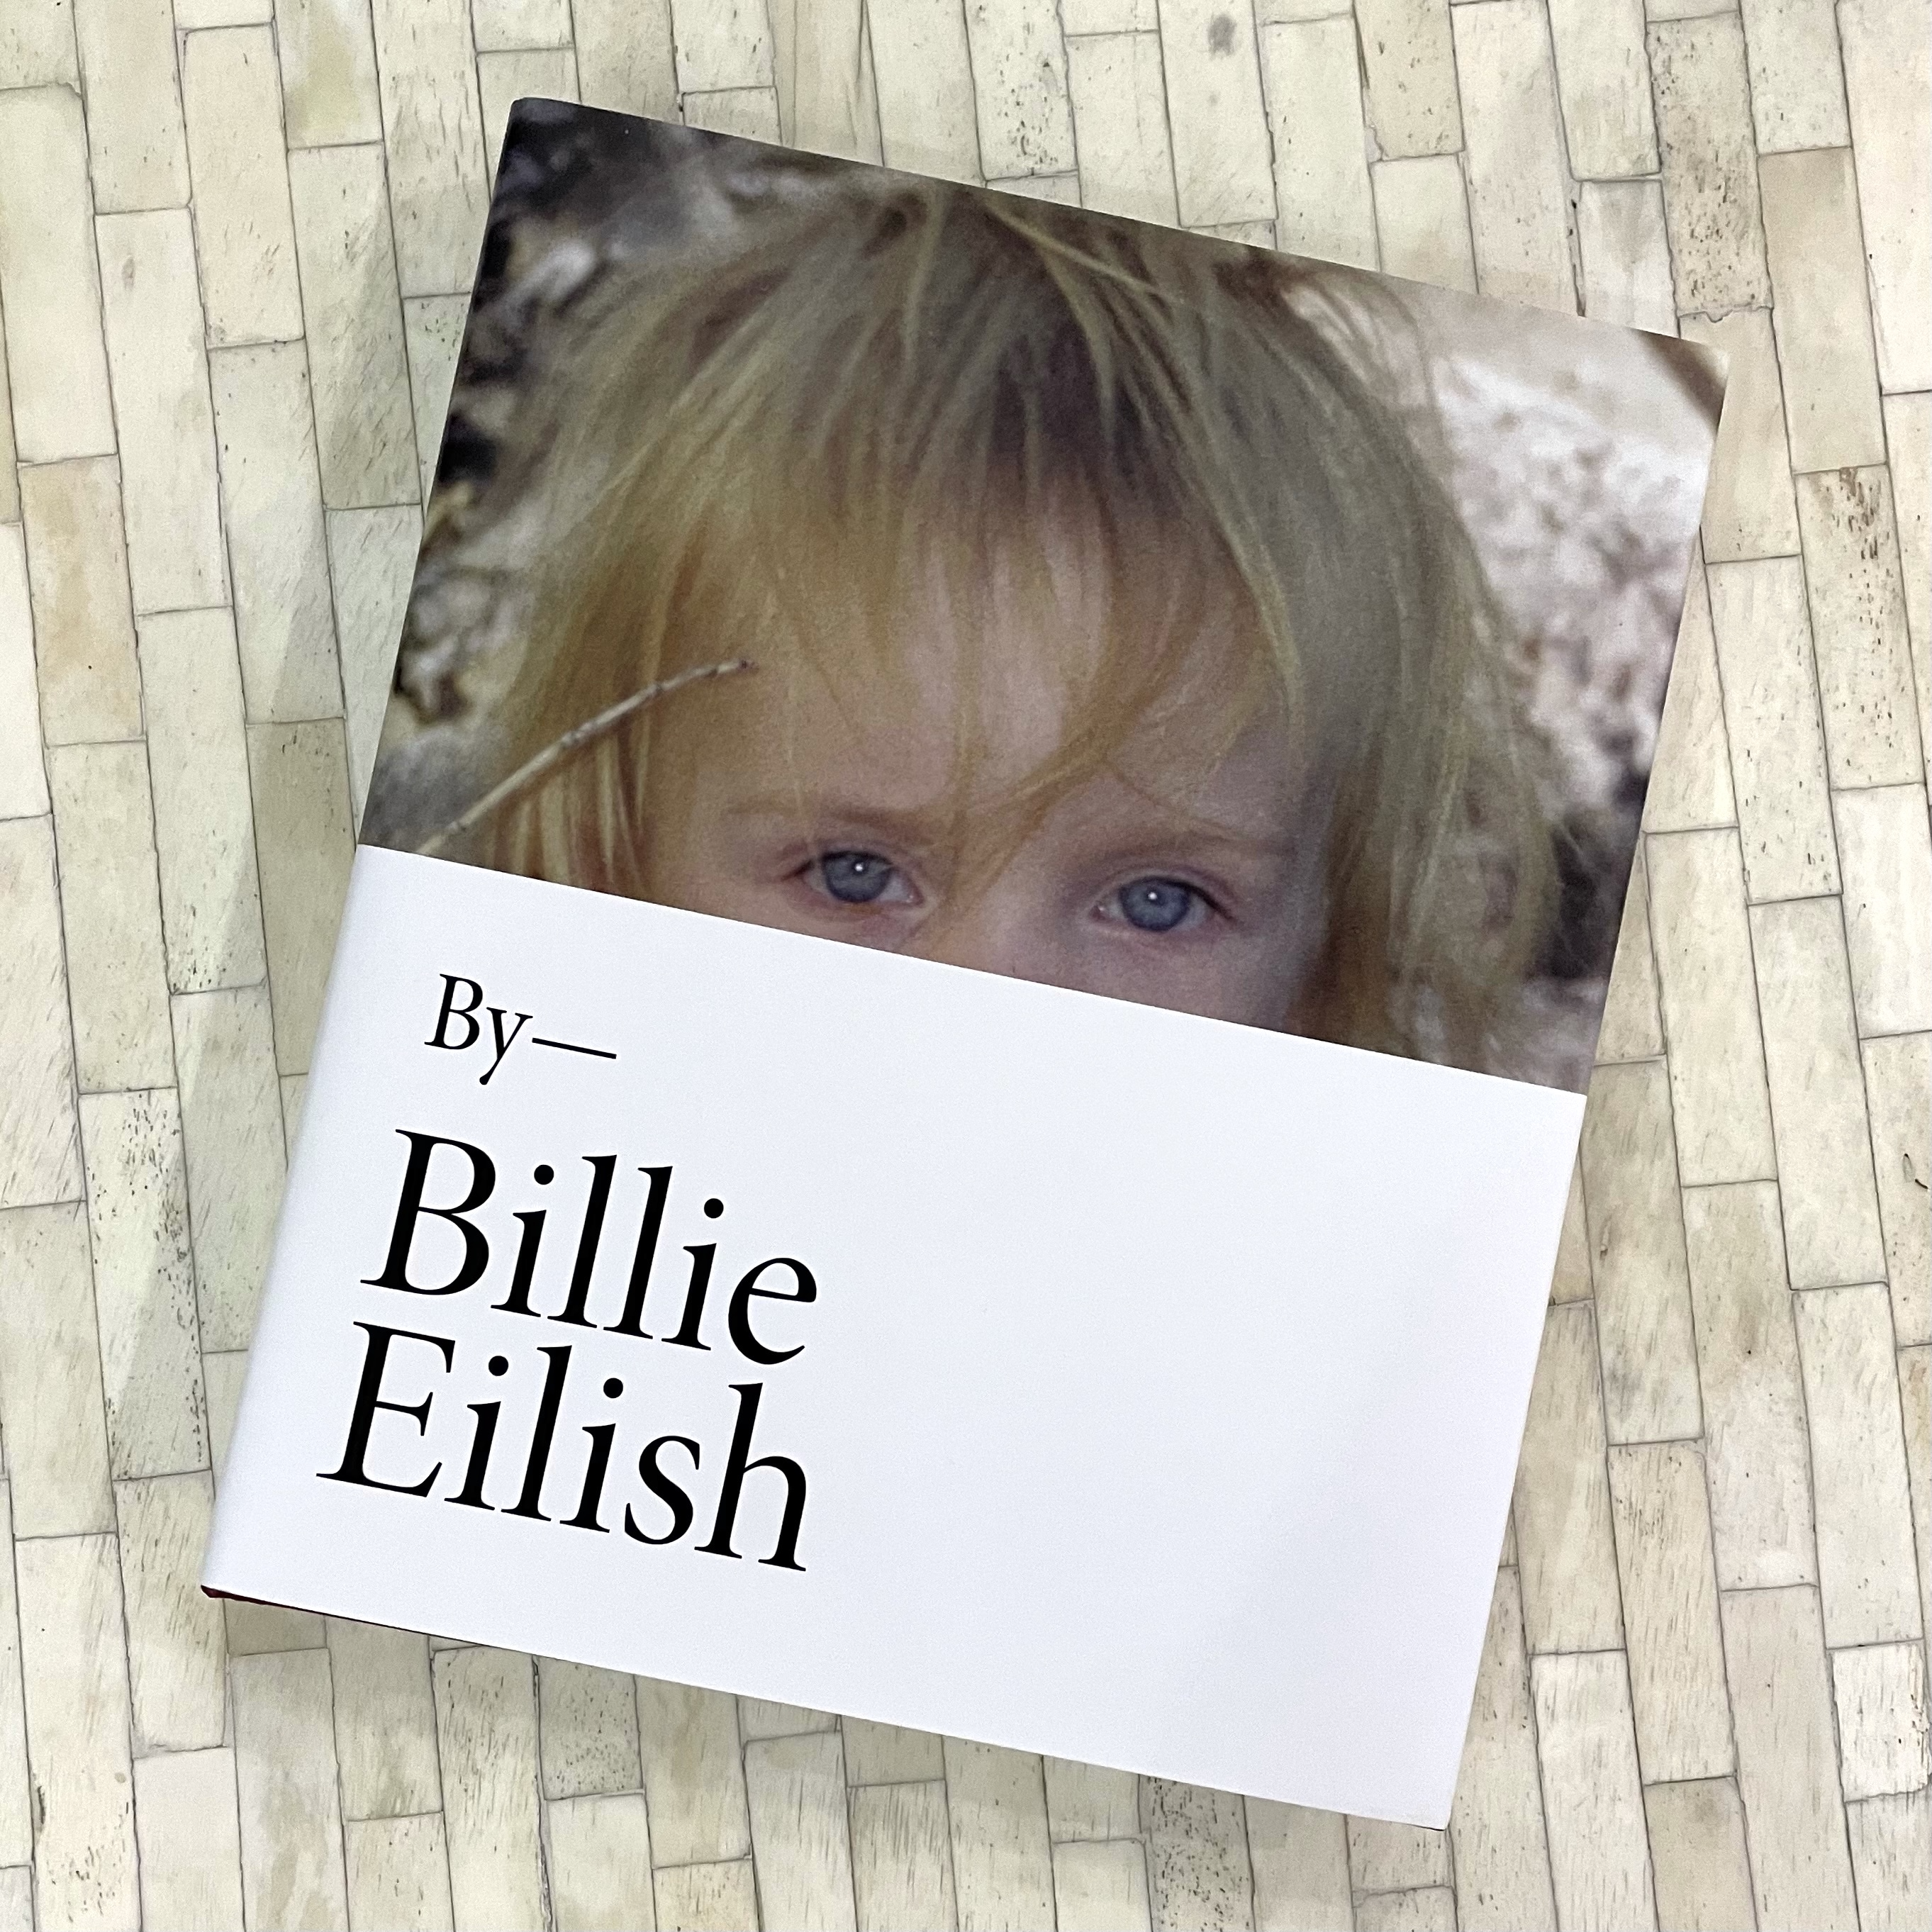 https://www.billieforum.com/media/billie_photo_book_release-png.4696/full